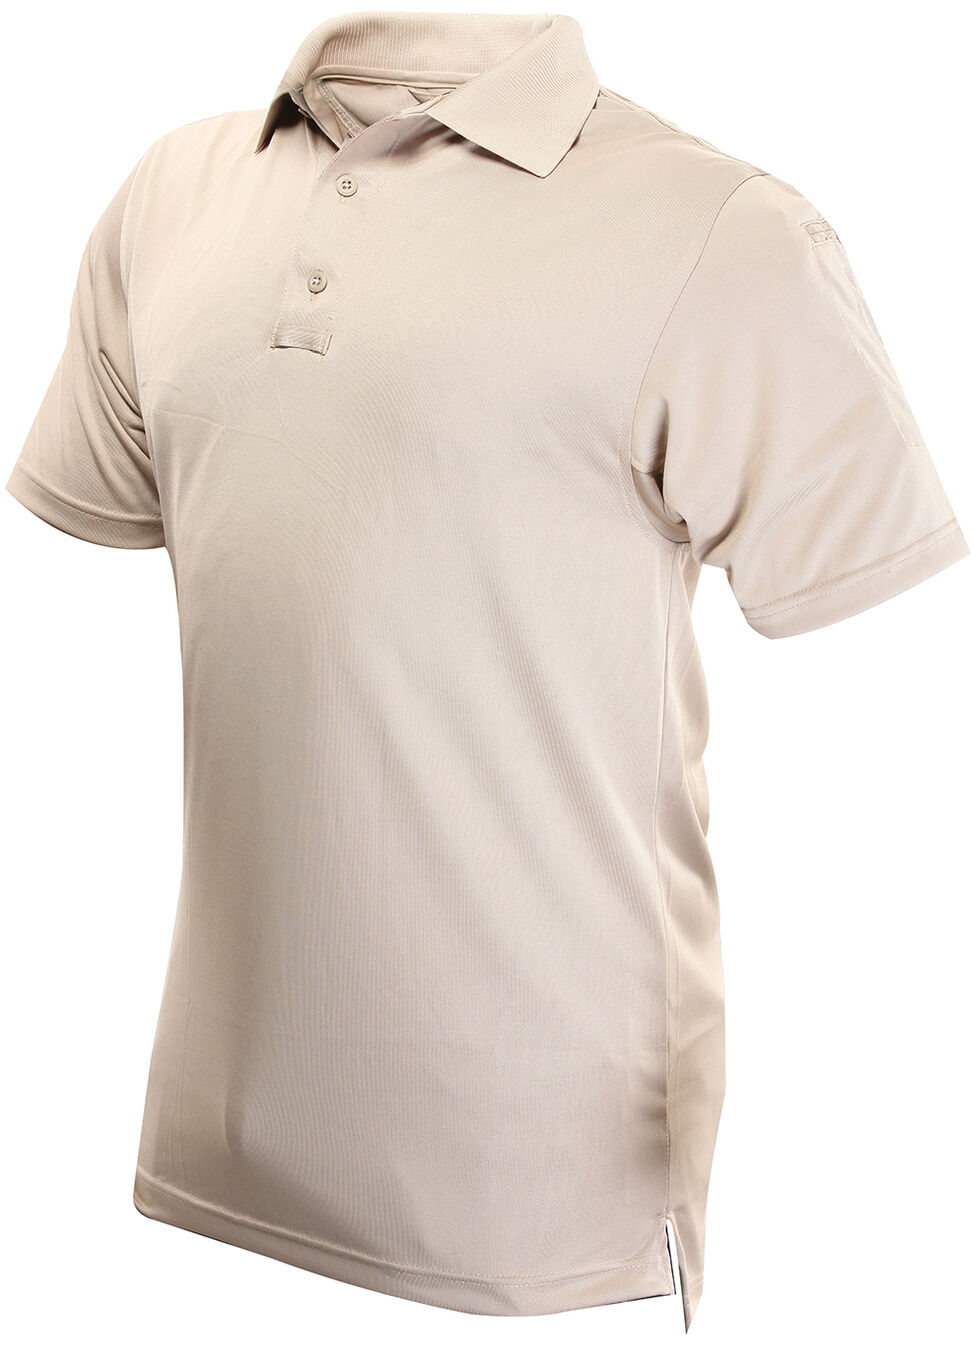 Tru-Spec Men's 24-7 Series Short Sleeve Performance Polo Shirt - Extra Large (2XL - 5XL), Tan, hi-res